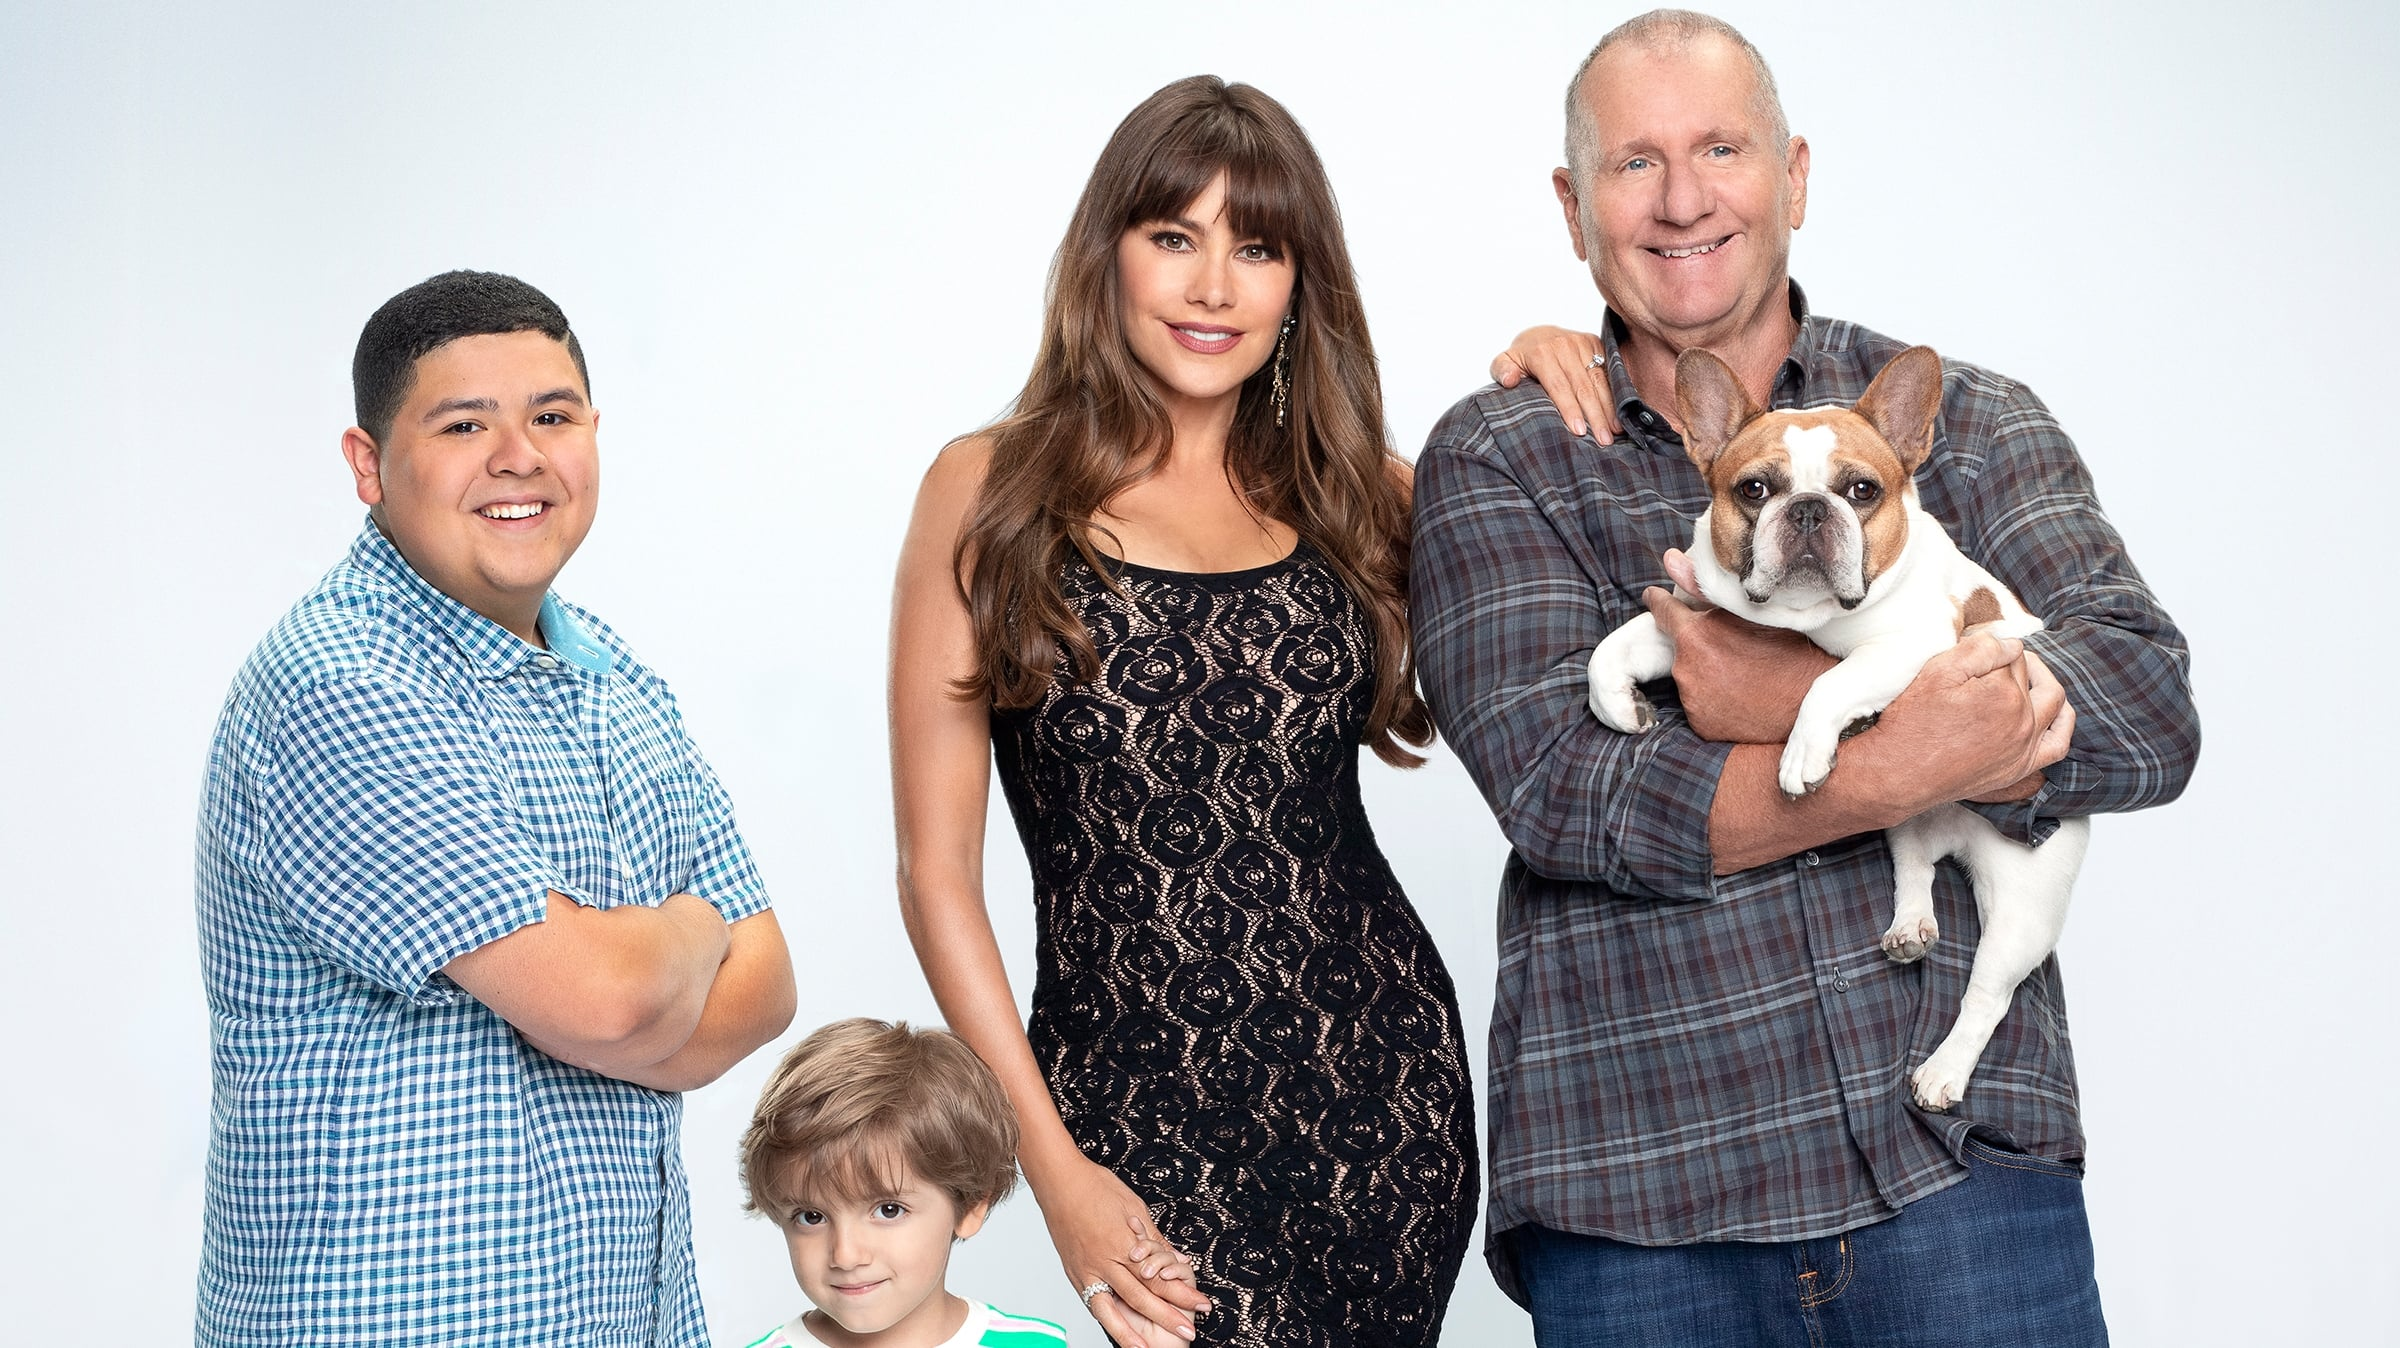 Modern Family - Season 11 Episode 1